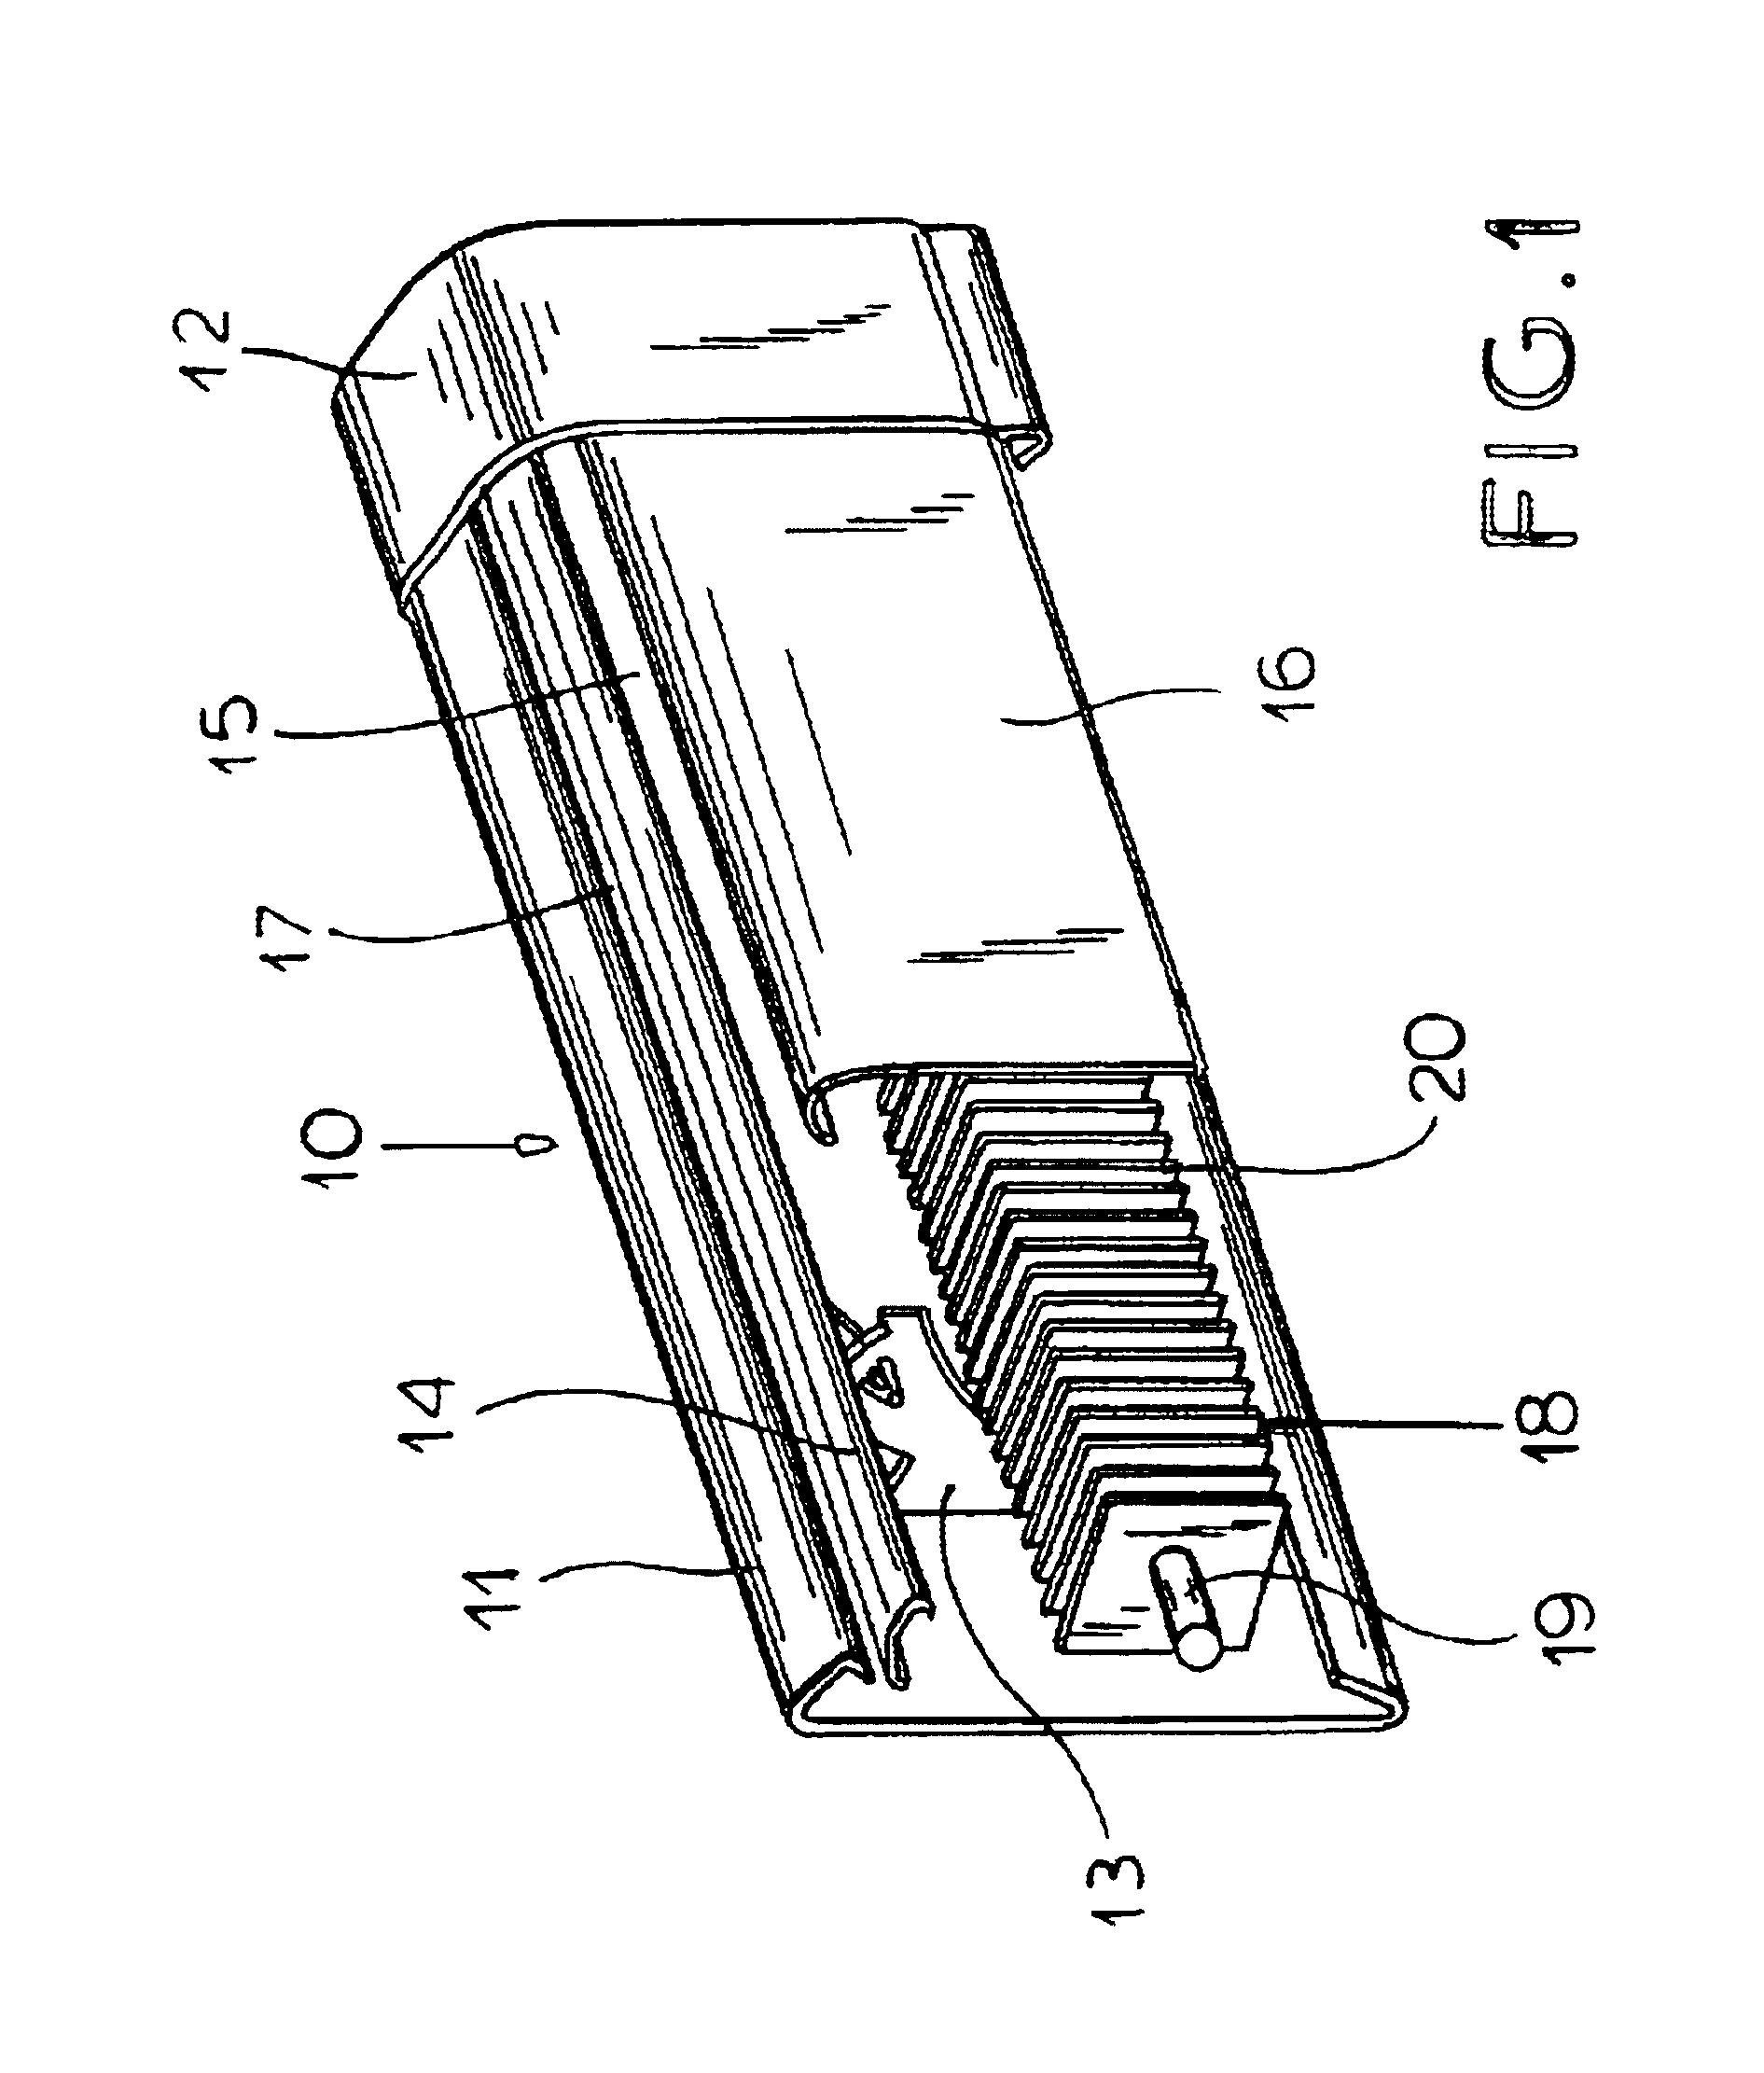 patent us6834710 pivot assembly for baseboard heater. Black Bedroom Furniture Sets. Home Design Ideas